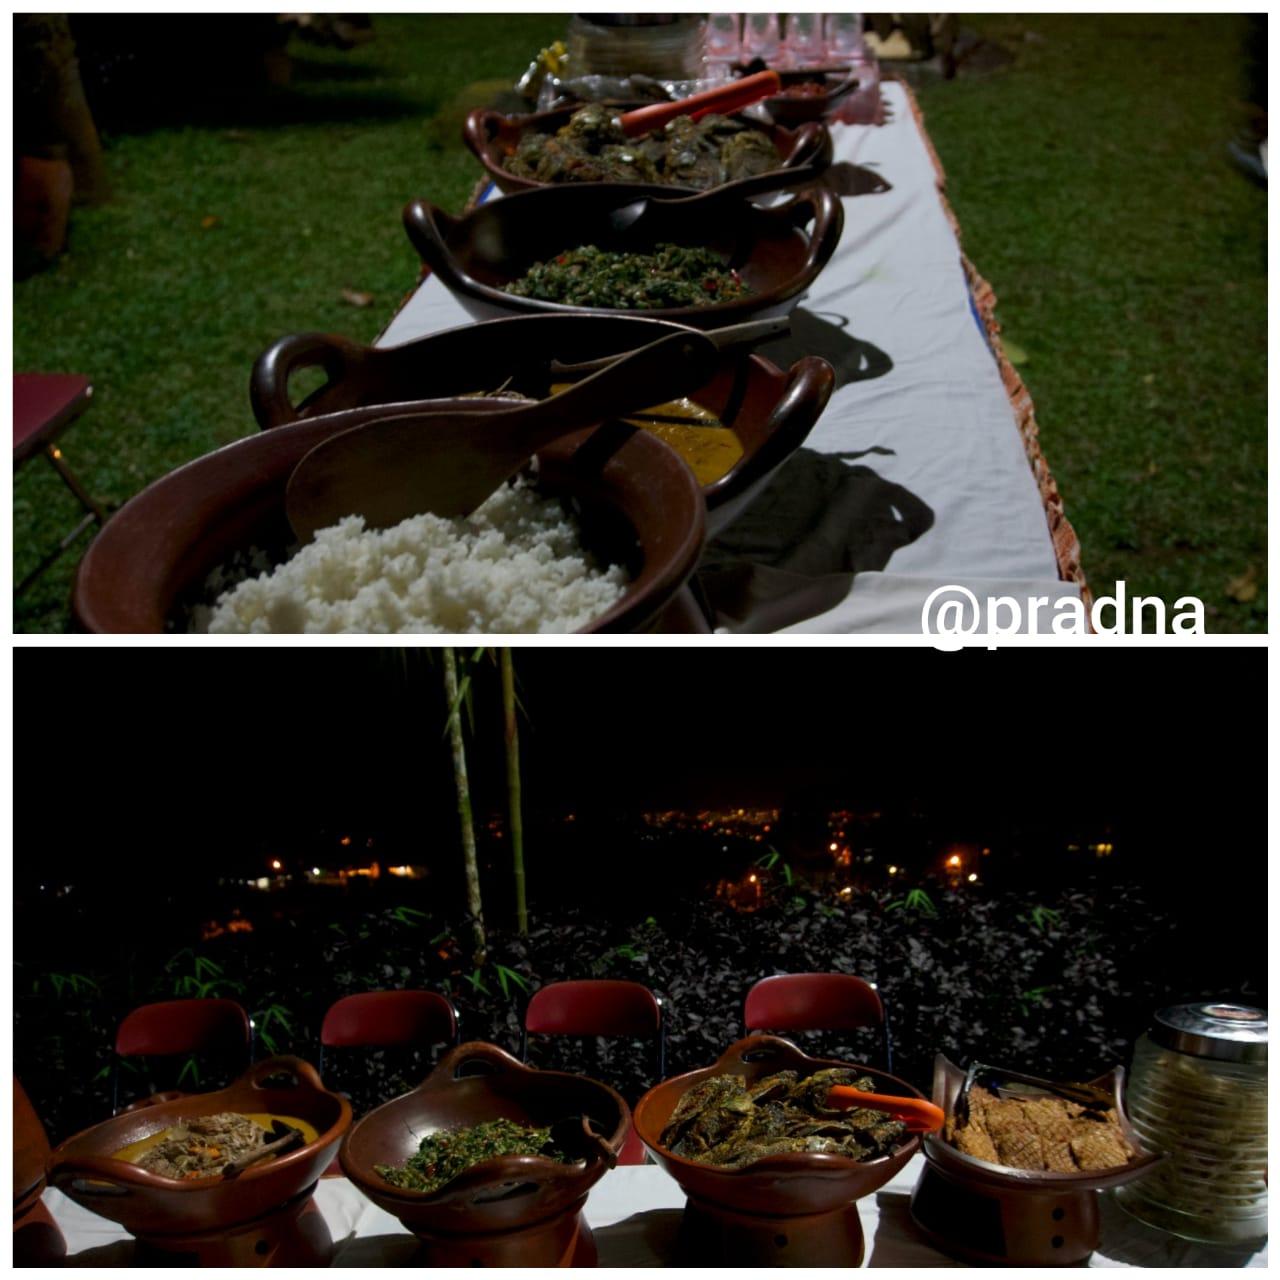 blogger makan prasmanan palawi baturraden